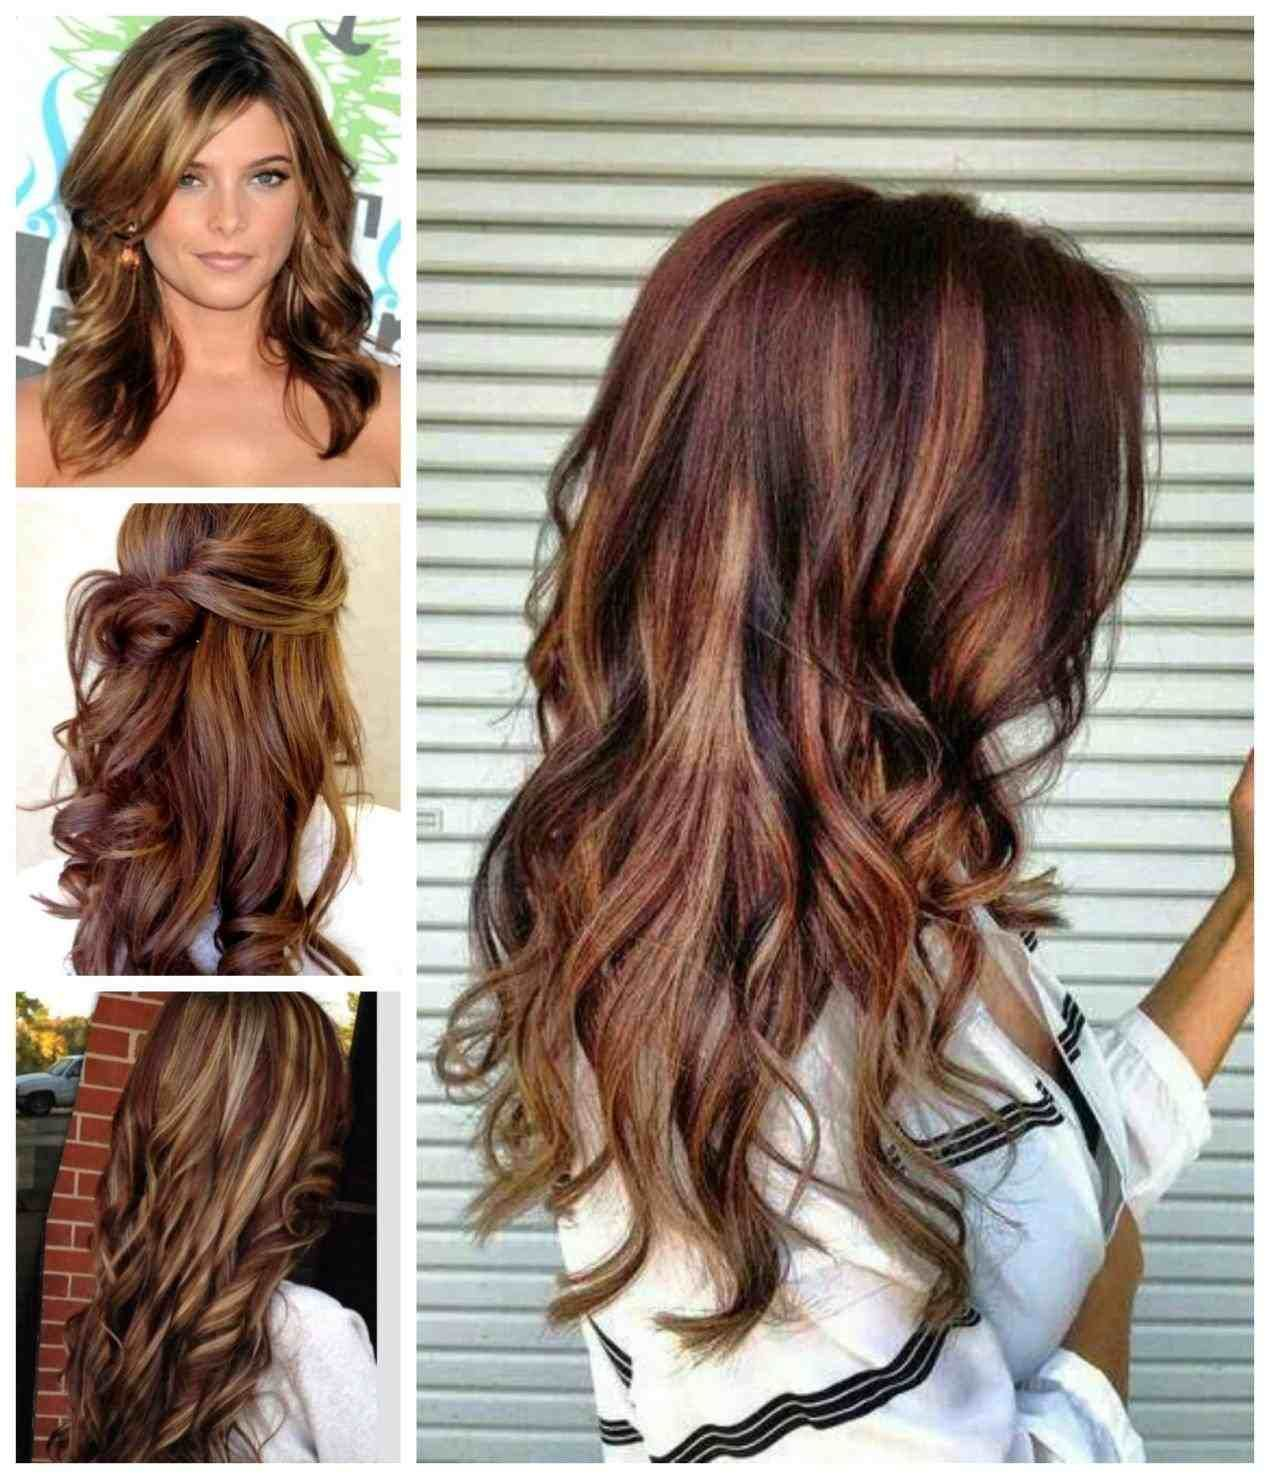 Brown Hair With Blonde Peekaboo Highlights Underneath Red